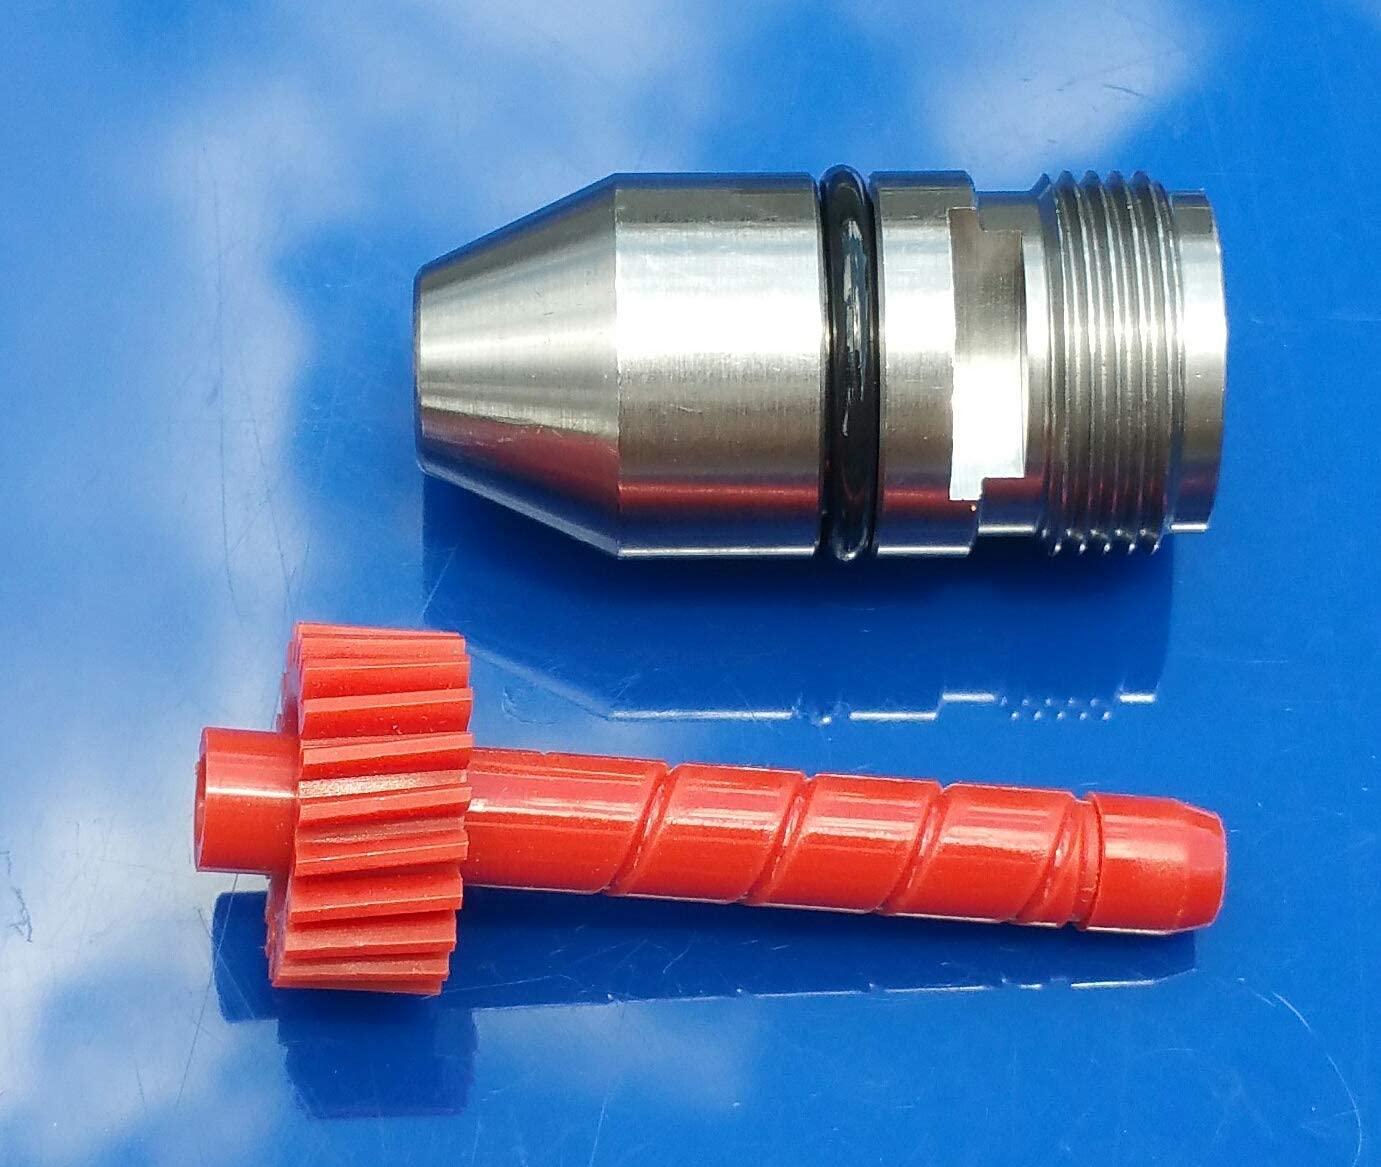 GM TURBO 350 TH350 MUNCIE POWERGLIDE TRANSMISSION SPEEDOMETER GEAR 21 TEETH RED SPEEDO W/BULLET